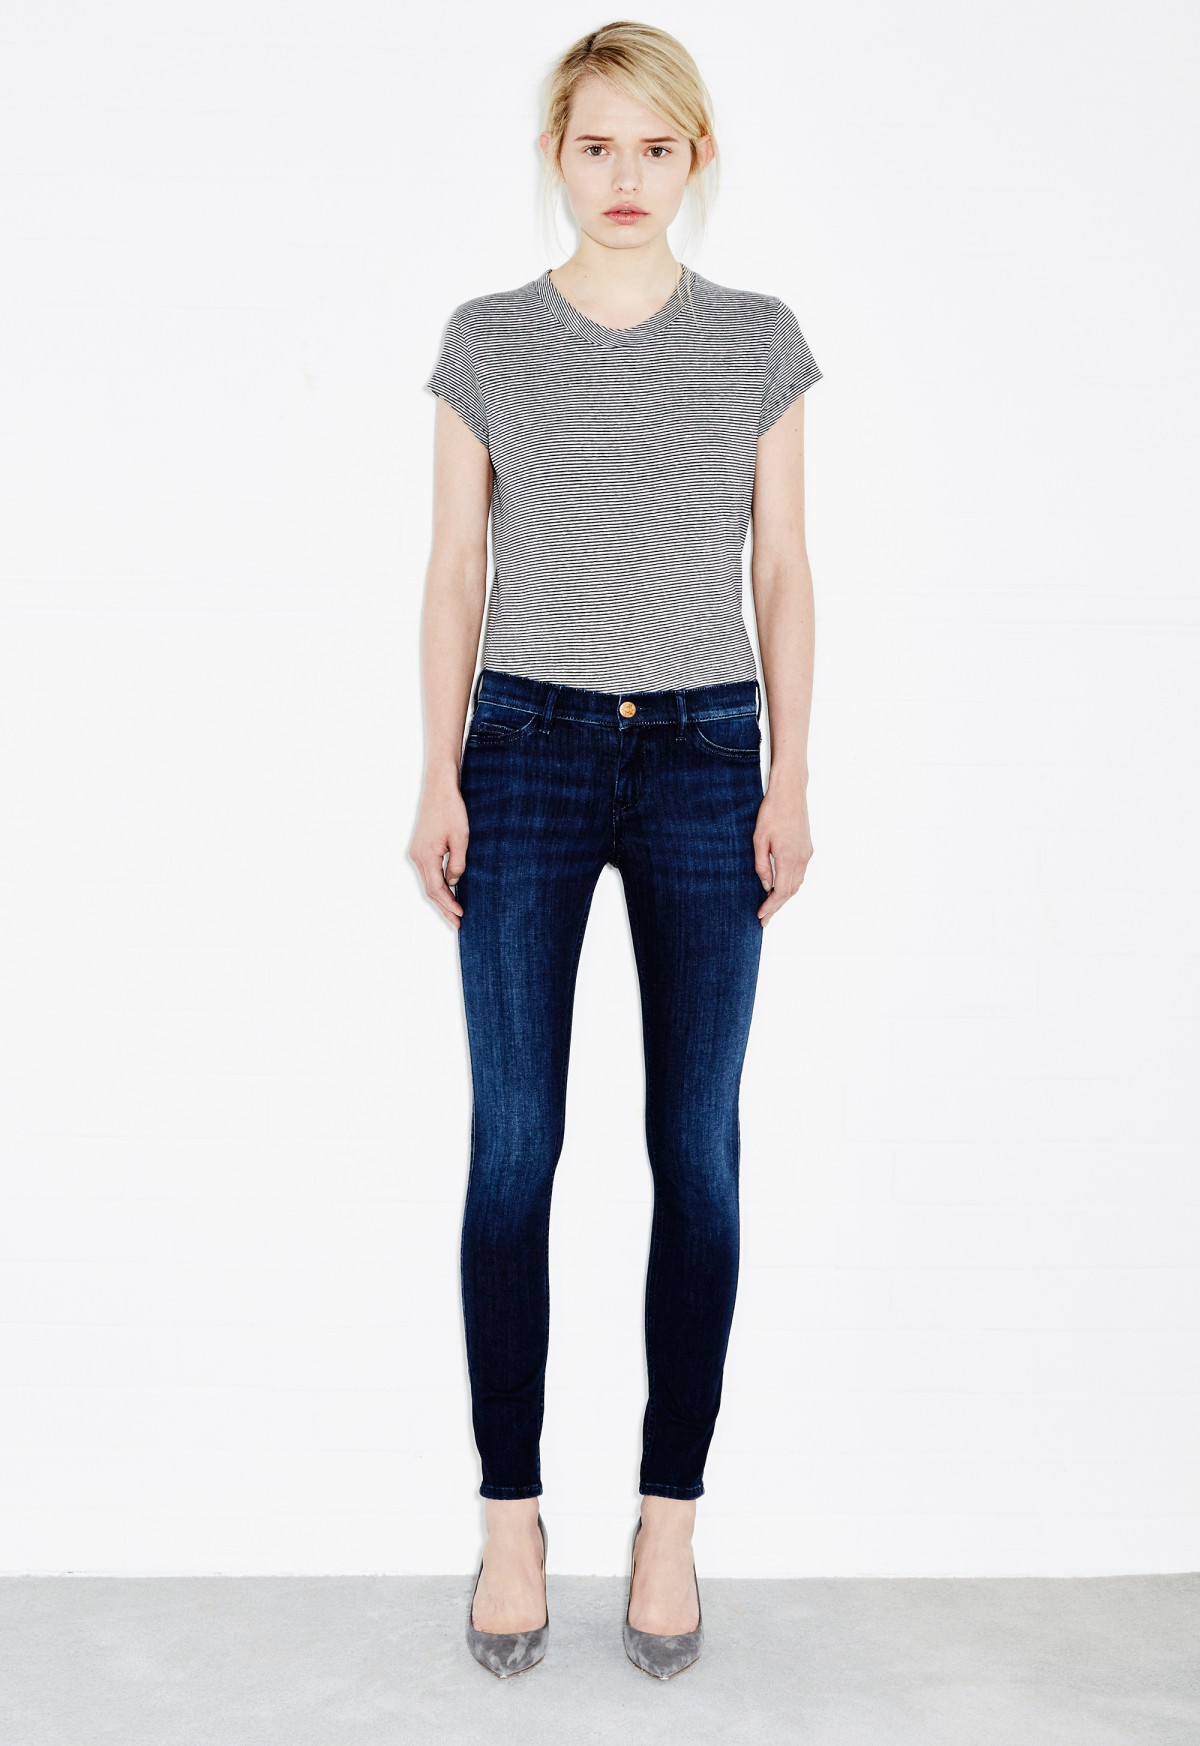 Mih jeans Superfit Skinny Jean in Blue (Petit)